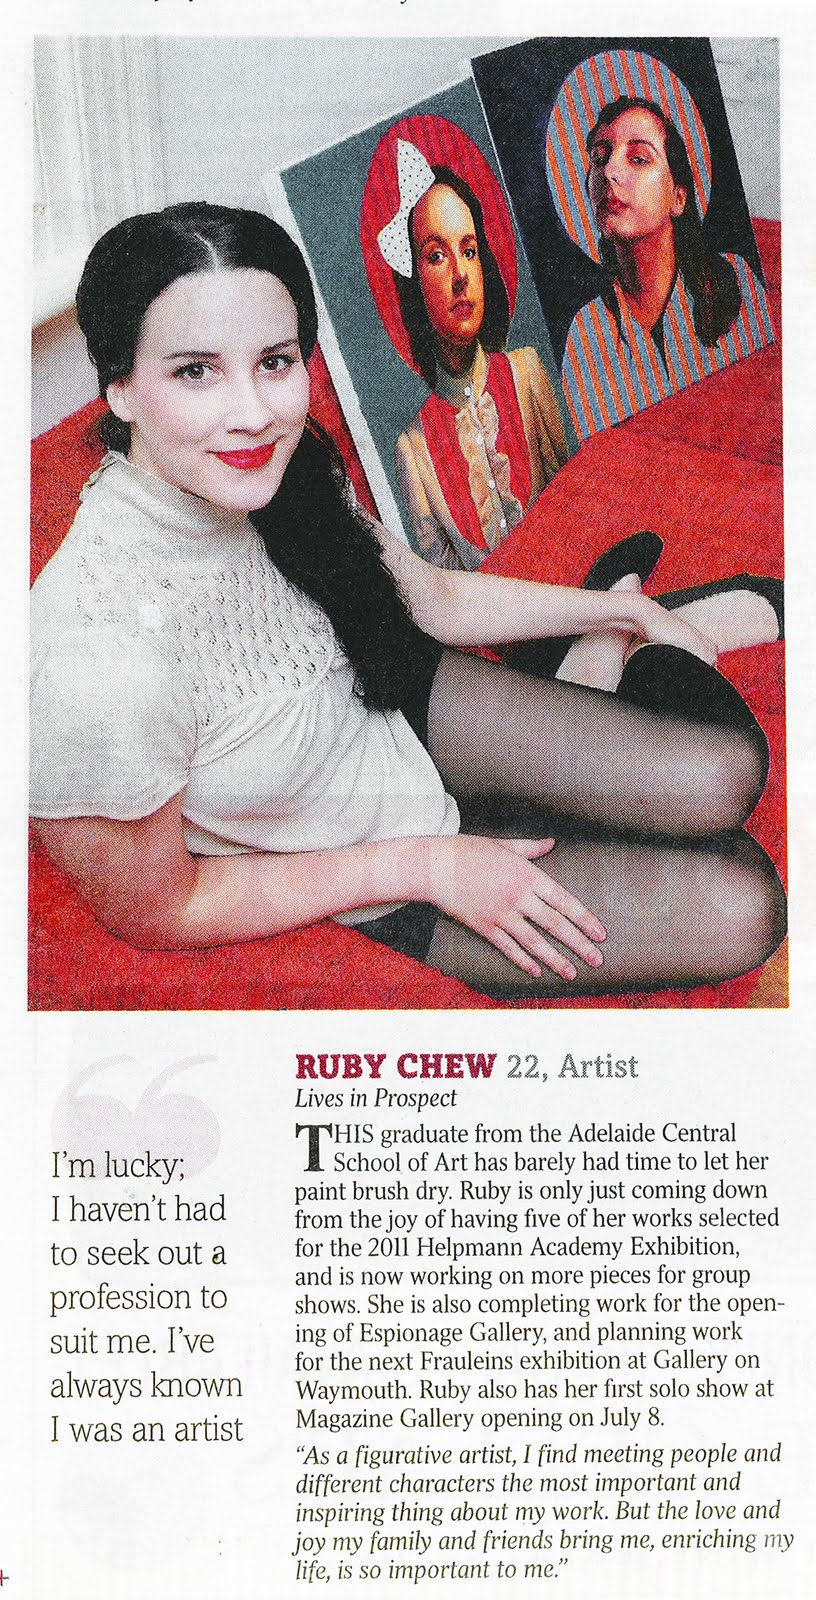 Walsh L, Seven Stars, Sunday Mail, Jan 30, 2011